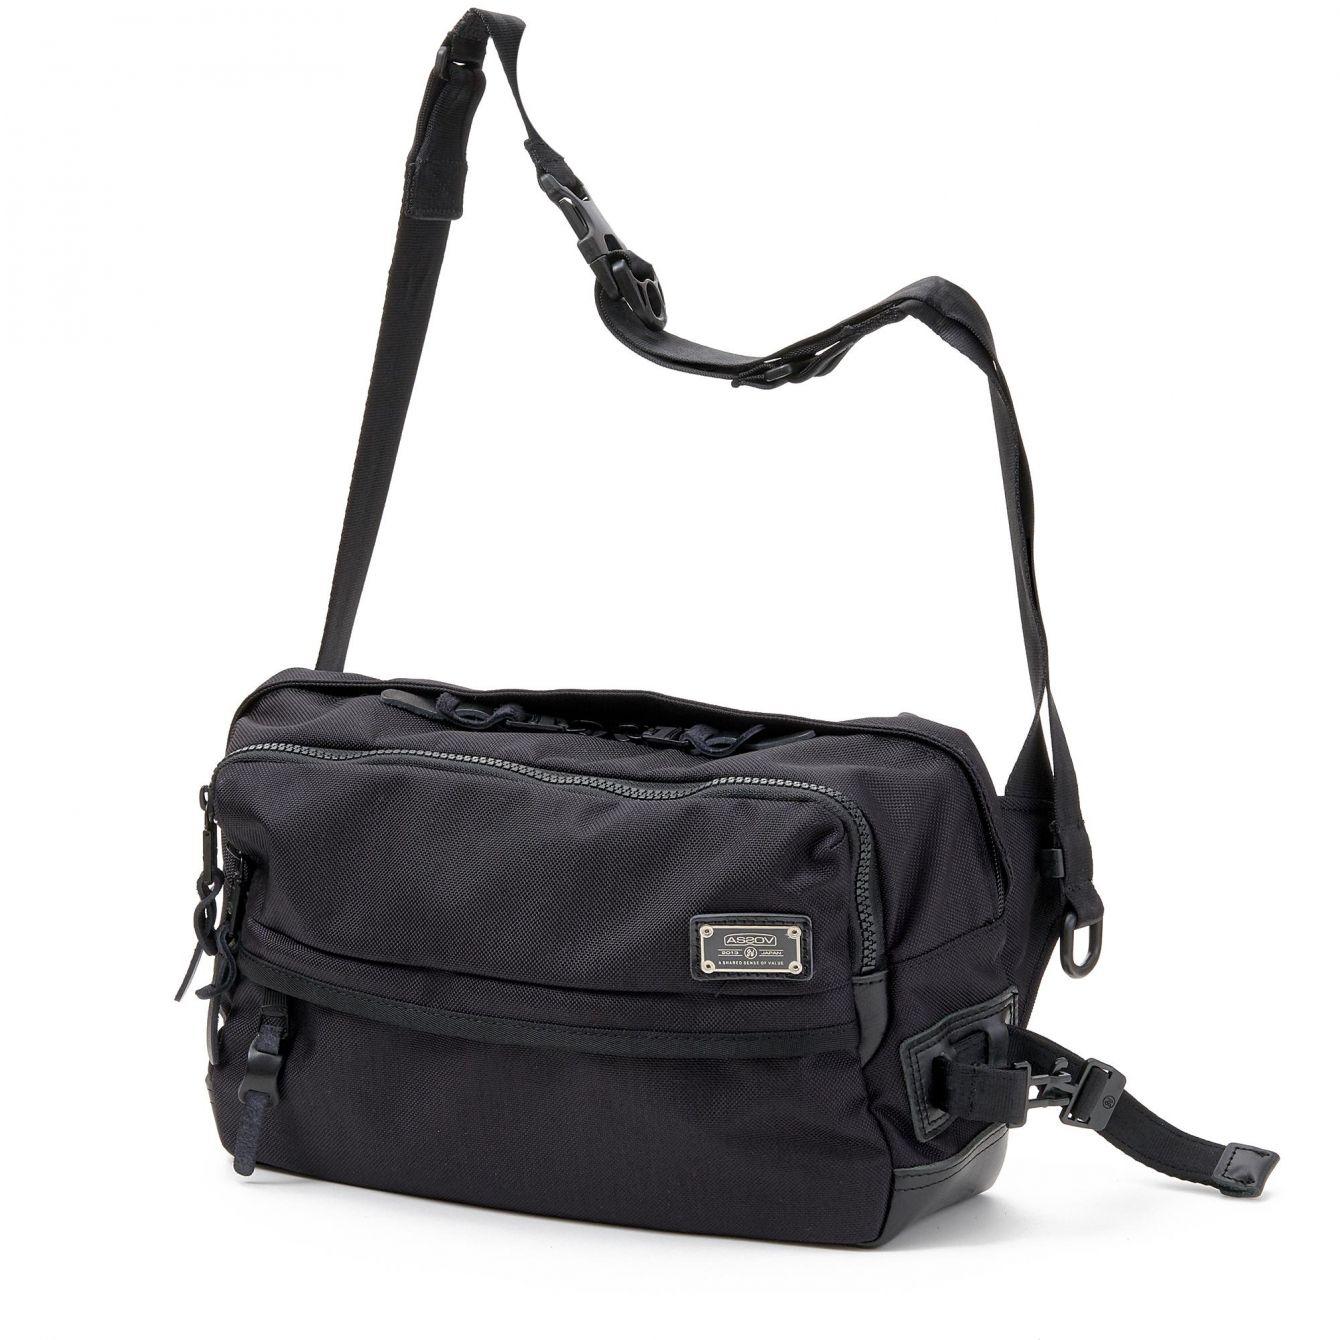 # 「AS2OV」包袋品牌獨家彈道尼龍:2WAY SHOULDER & BODY BAG 新品上市 2